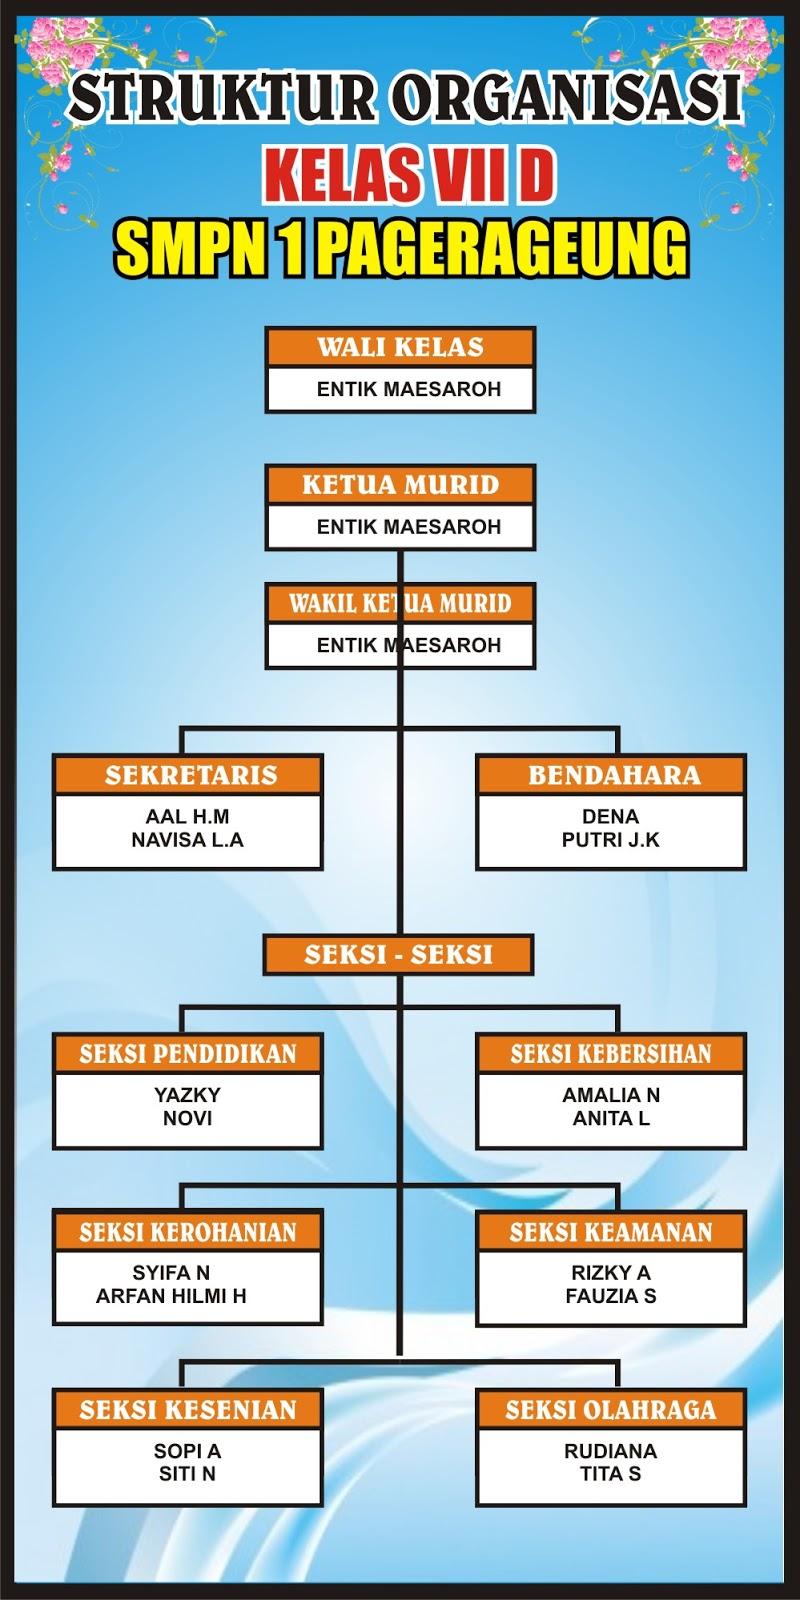 Download Desain Struktur Organisasi Cdr : download, desain, struktur, organisasi, Download, Desain, Struktur, Organisasi, Kelas, Coreldraw, Quotes